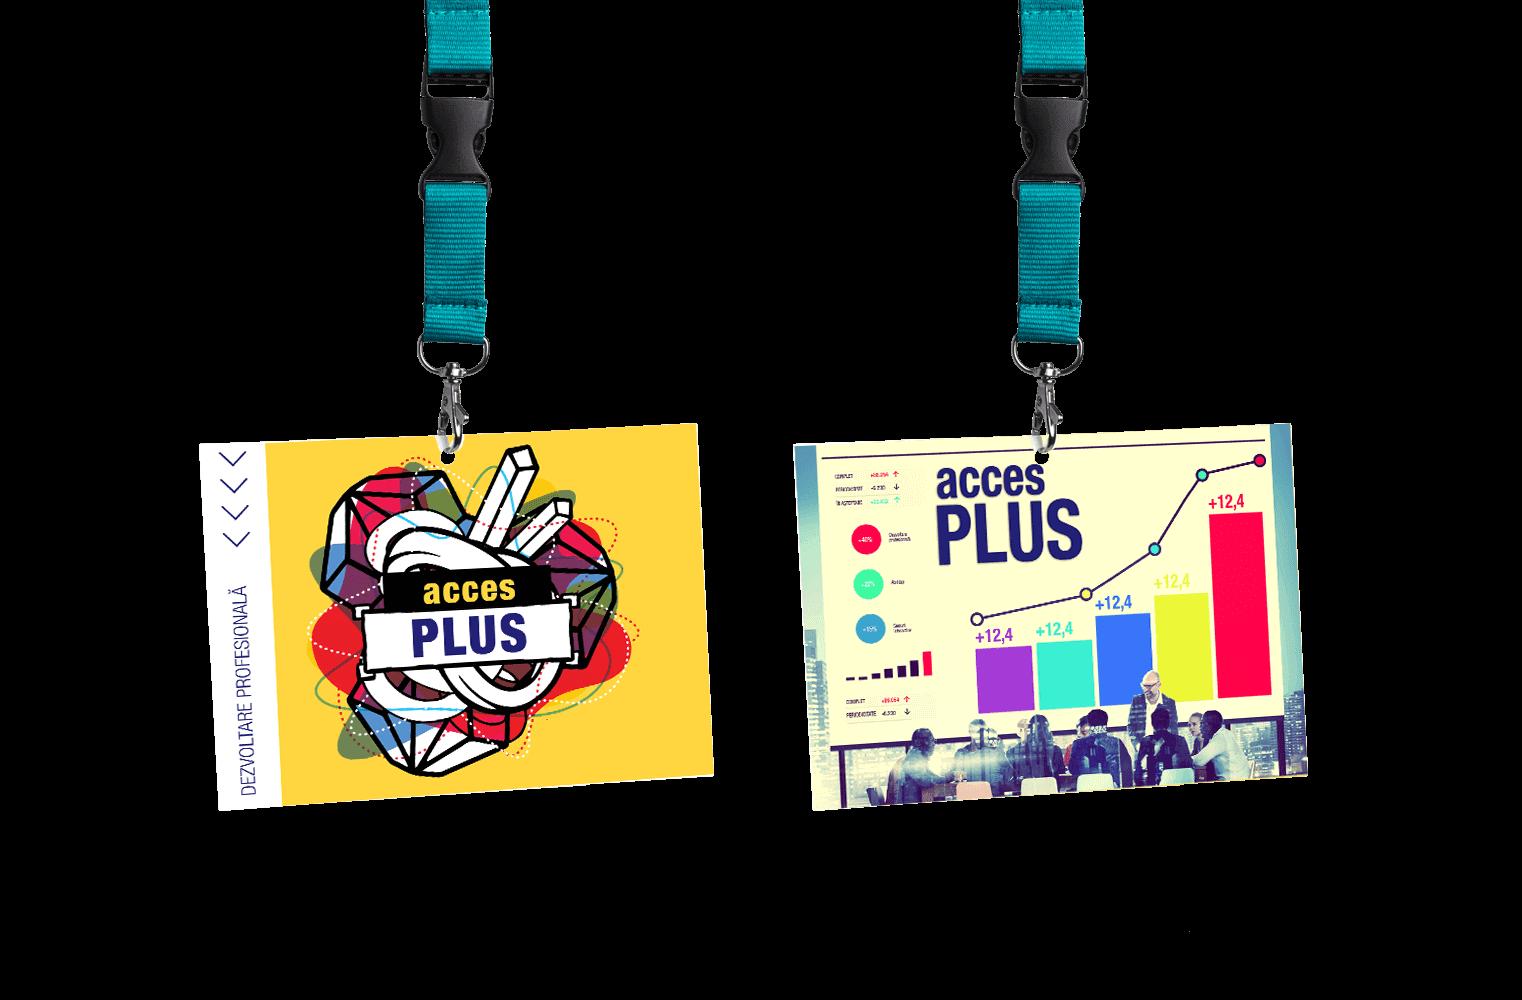 bd-card-badge-3